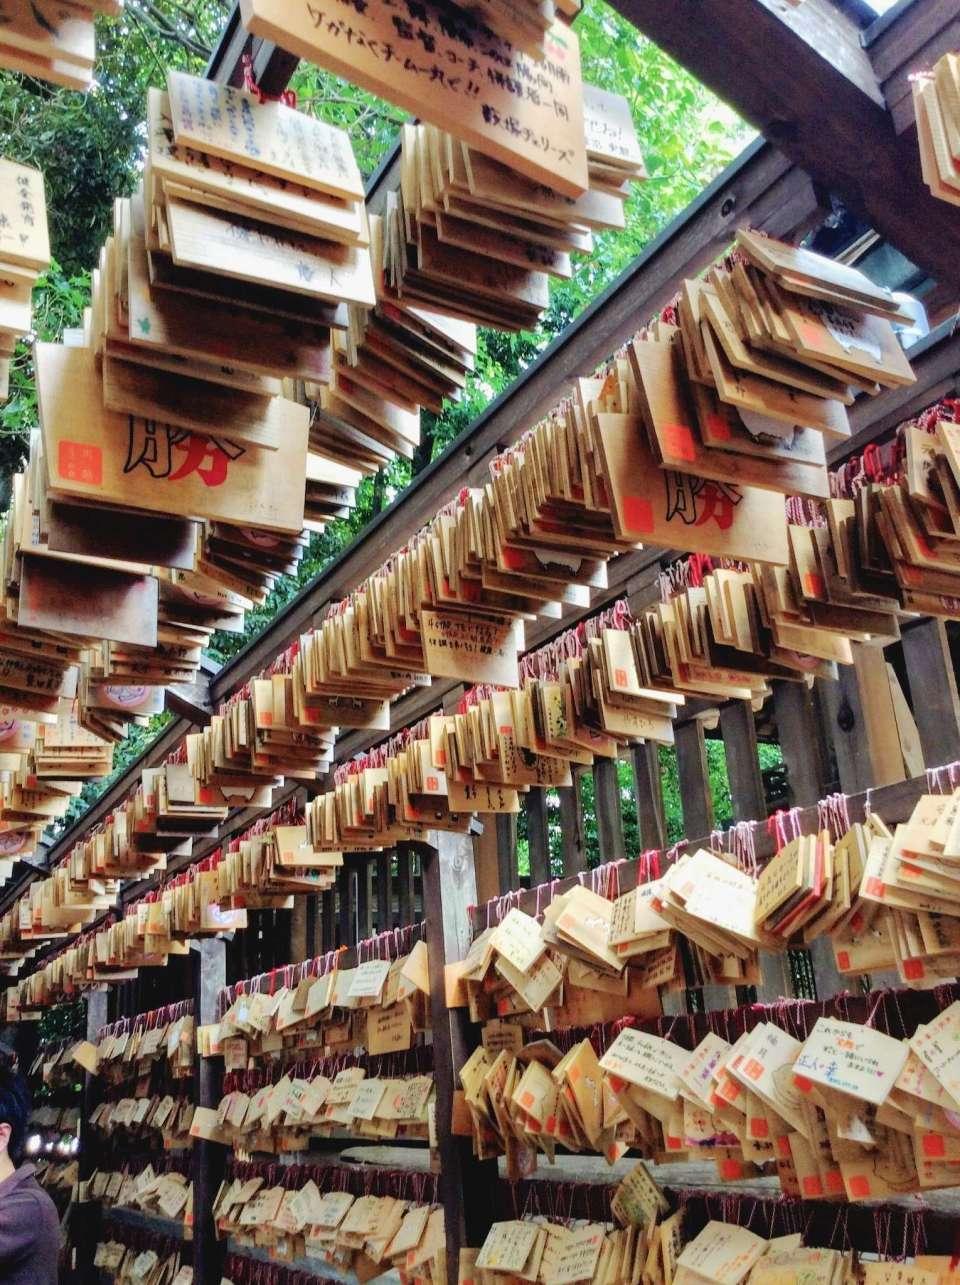 Regular Ema for writing your prayers at Hikawa Shrine